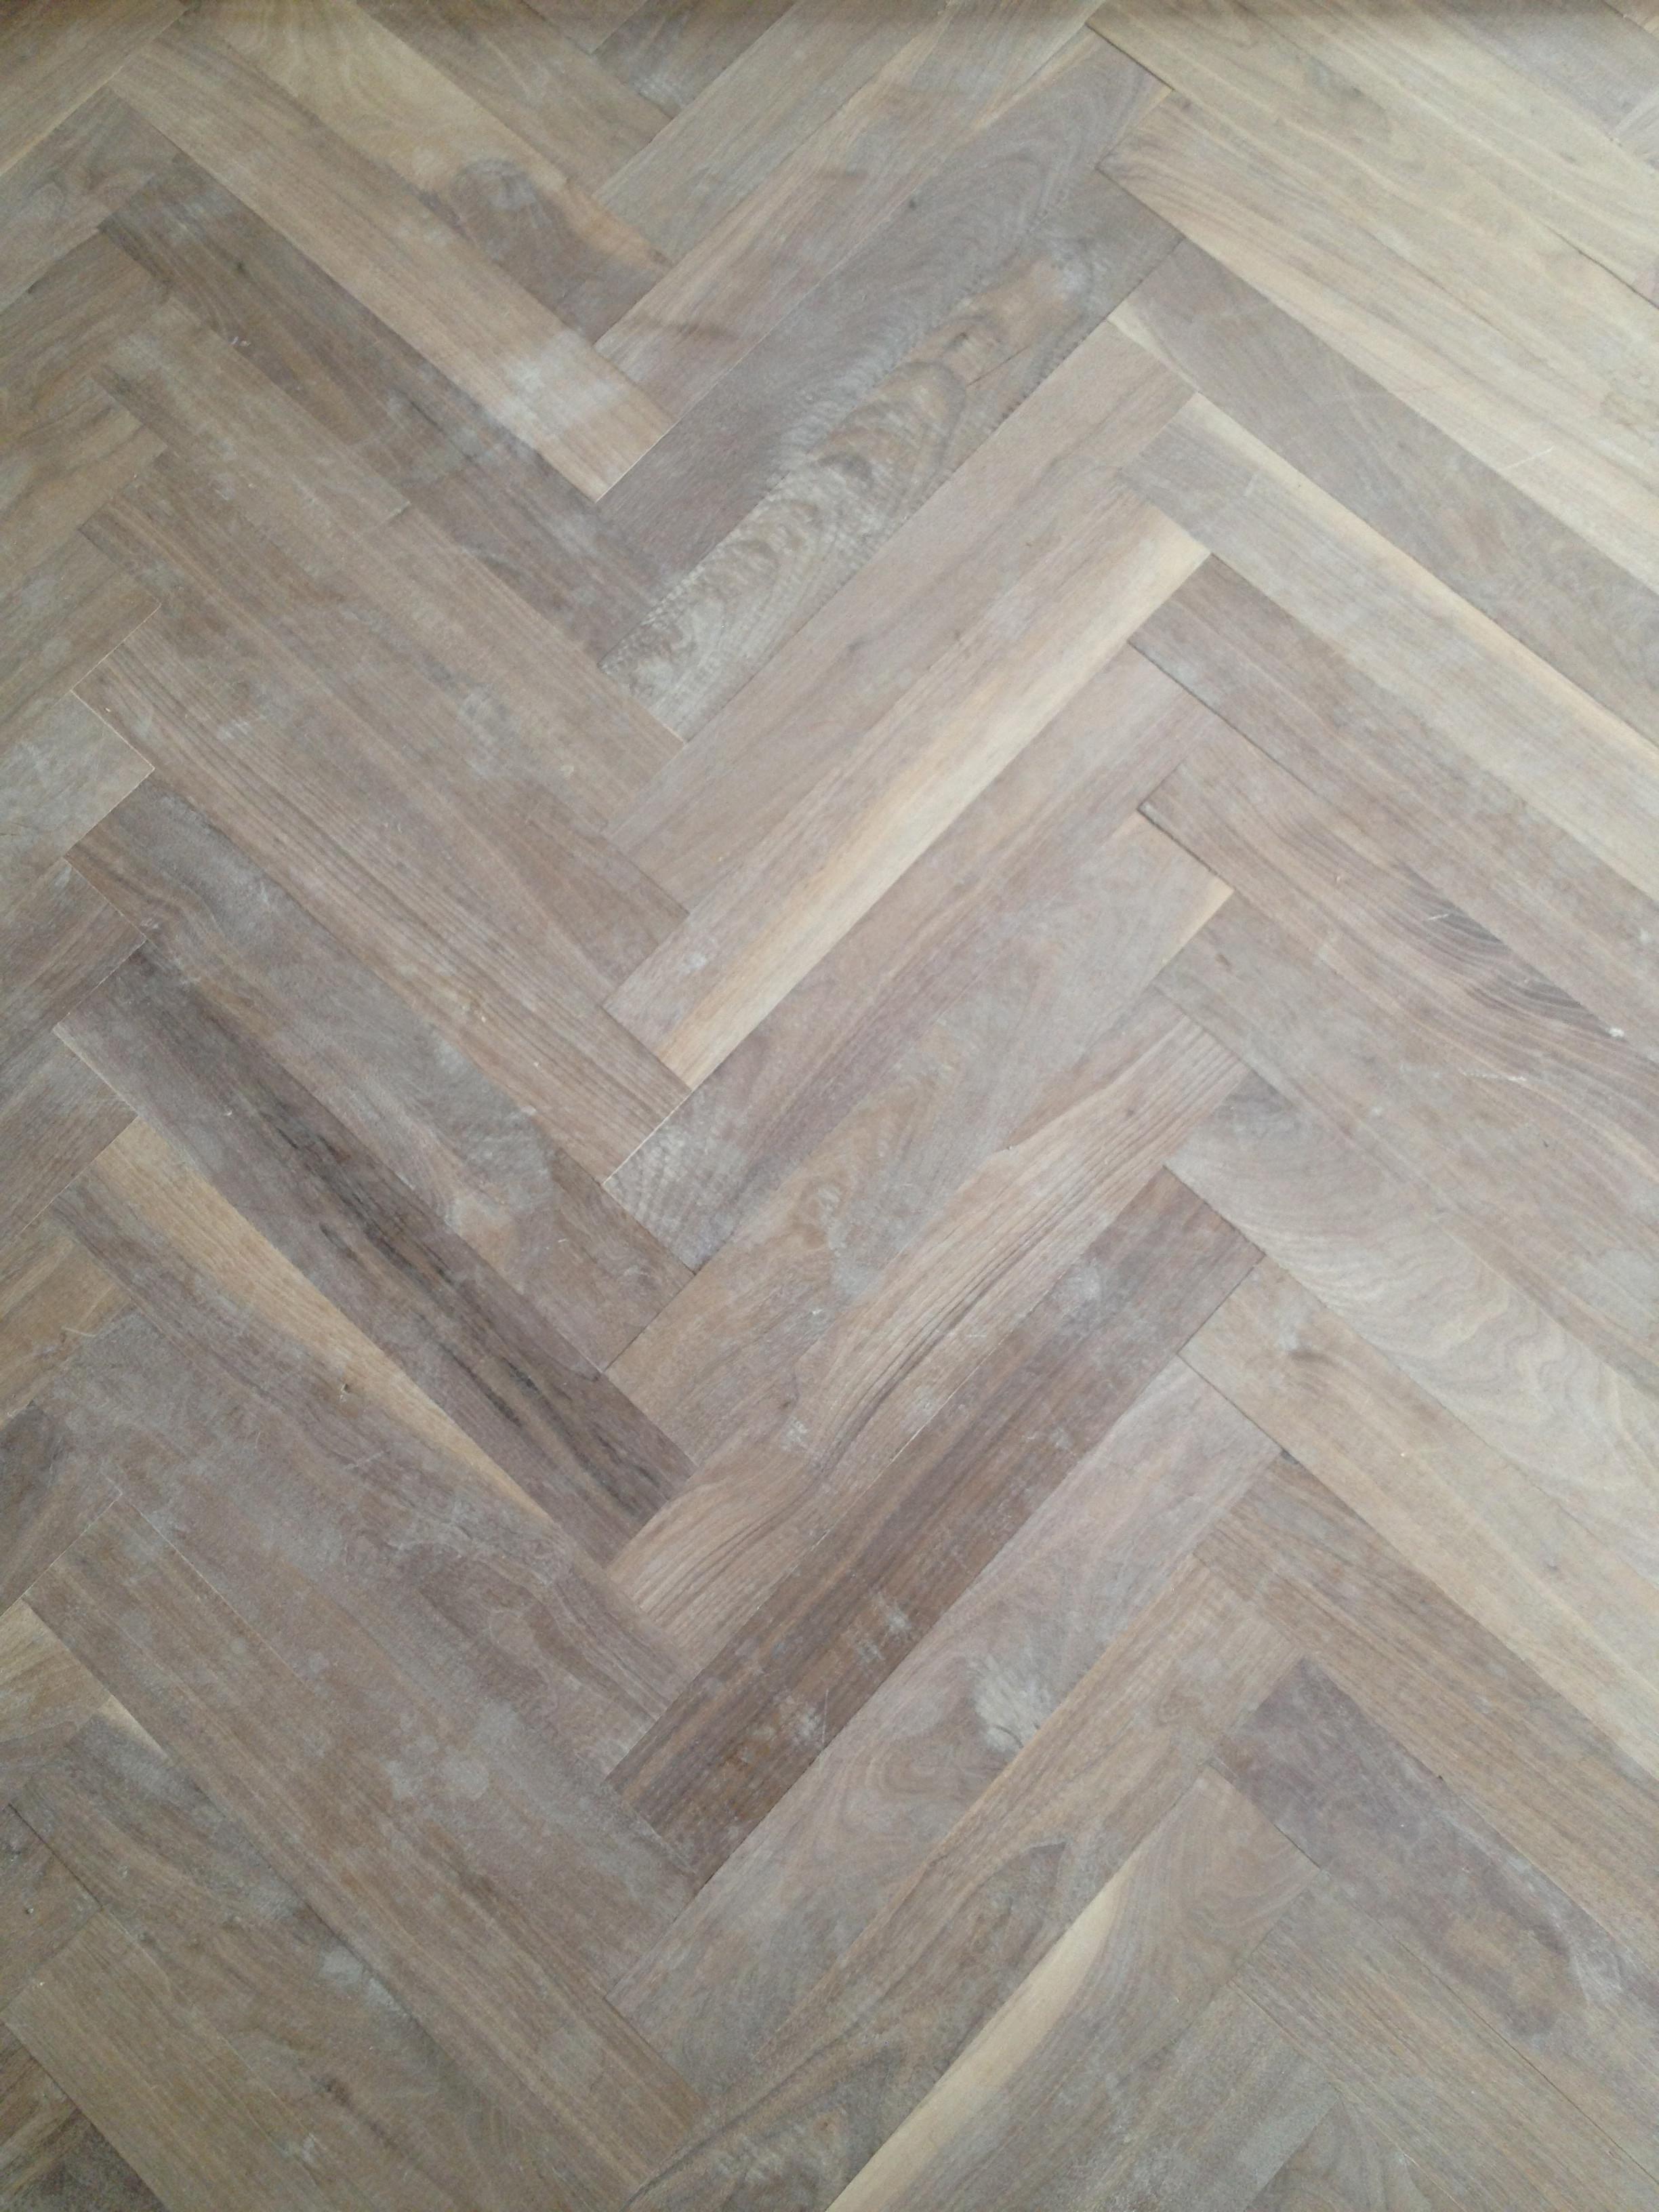 hardwood floor refinishing cherry hill nj of flooring portfolio gorsegner brothers within img 0363